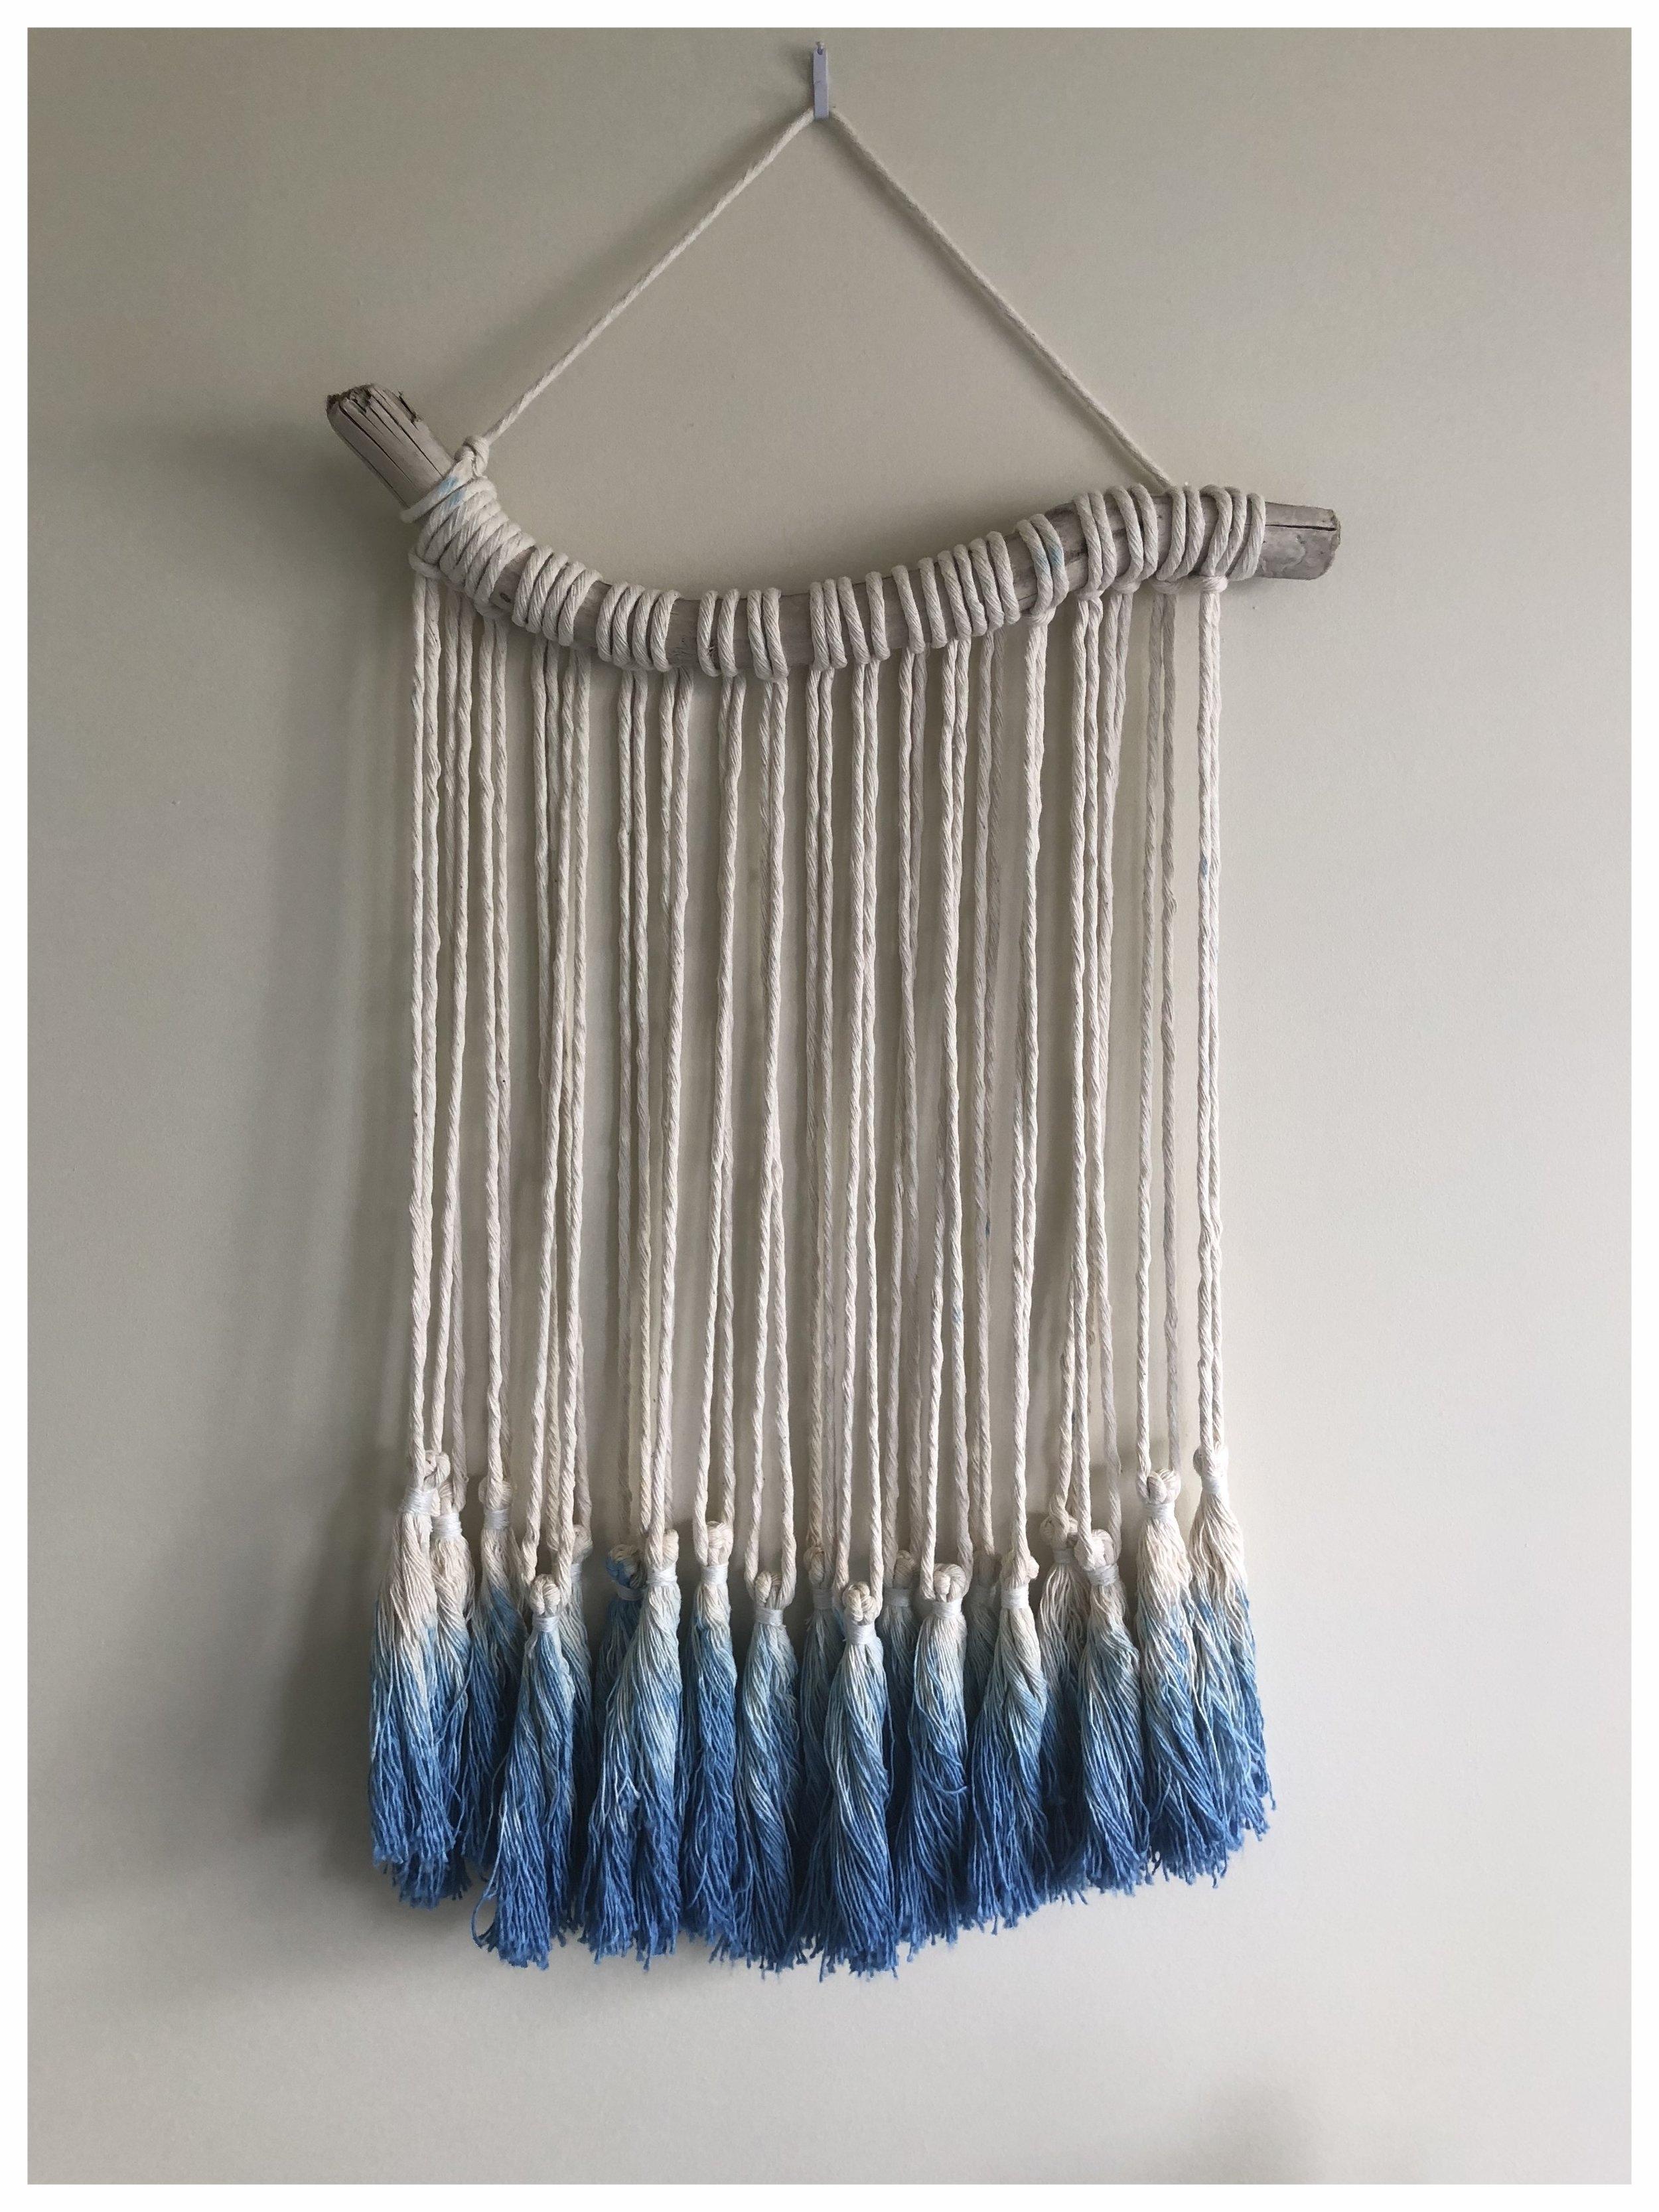 Handmade macrame wall hanging artwork | Ombre dye £64